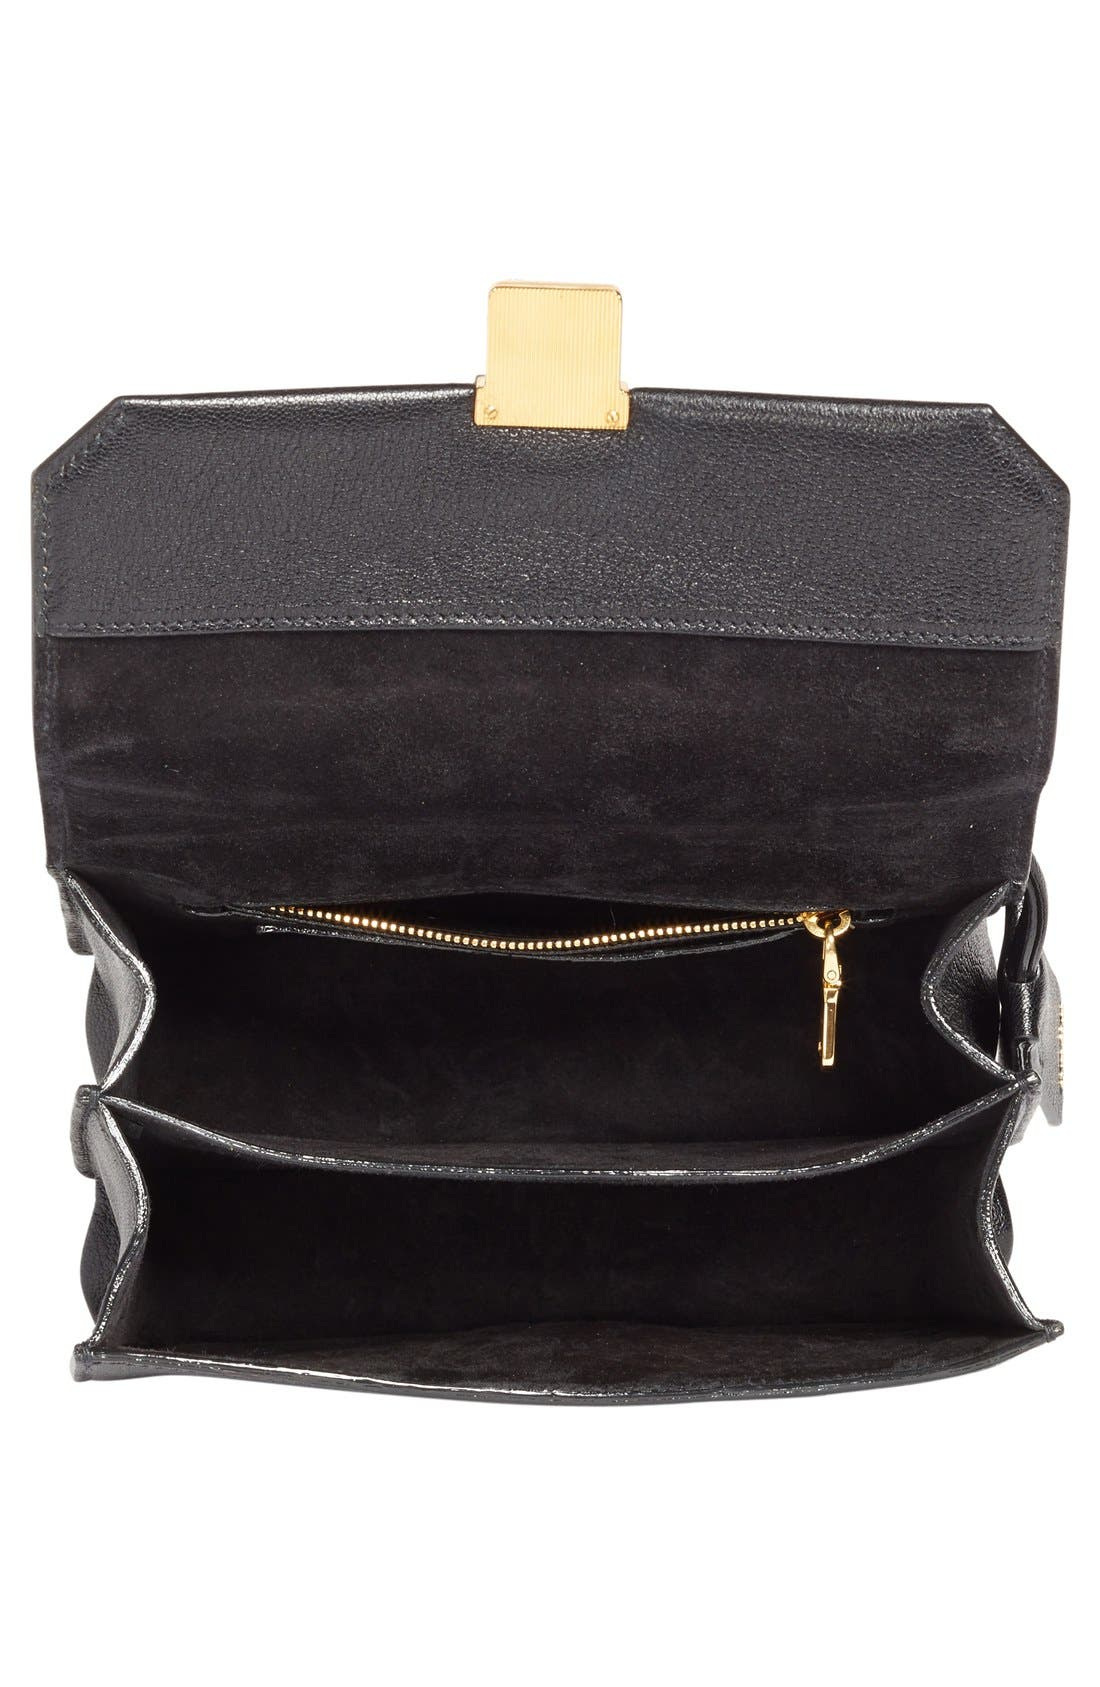 Alternate Image 4  - Miu Miu 'Small Madras' Goatskin Leather Shoulder Bag